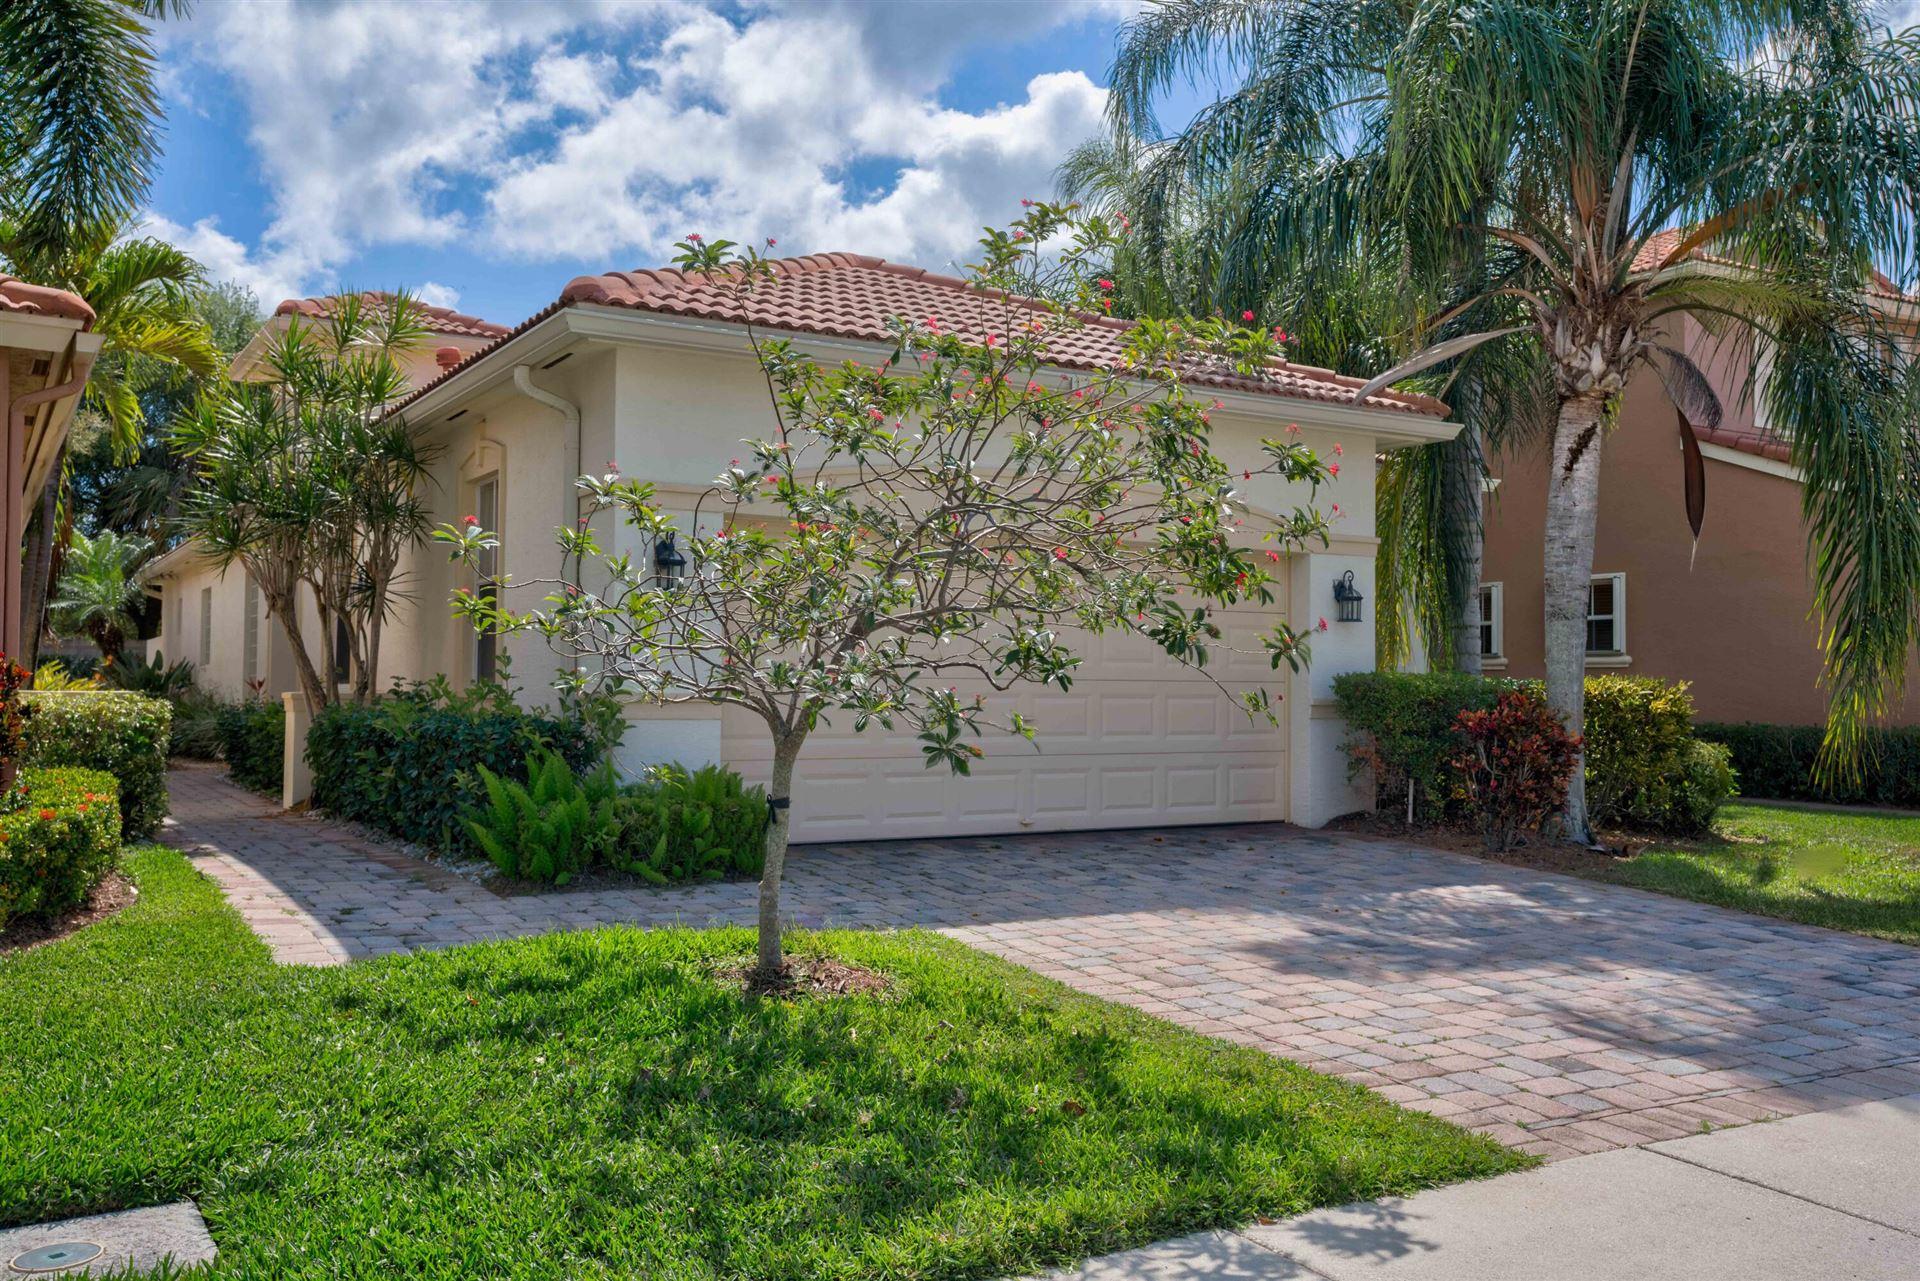 Photo of 175 Isle Verde Way, Palm Beach Gardens, FL 33418 (MLS # RX-10703057)